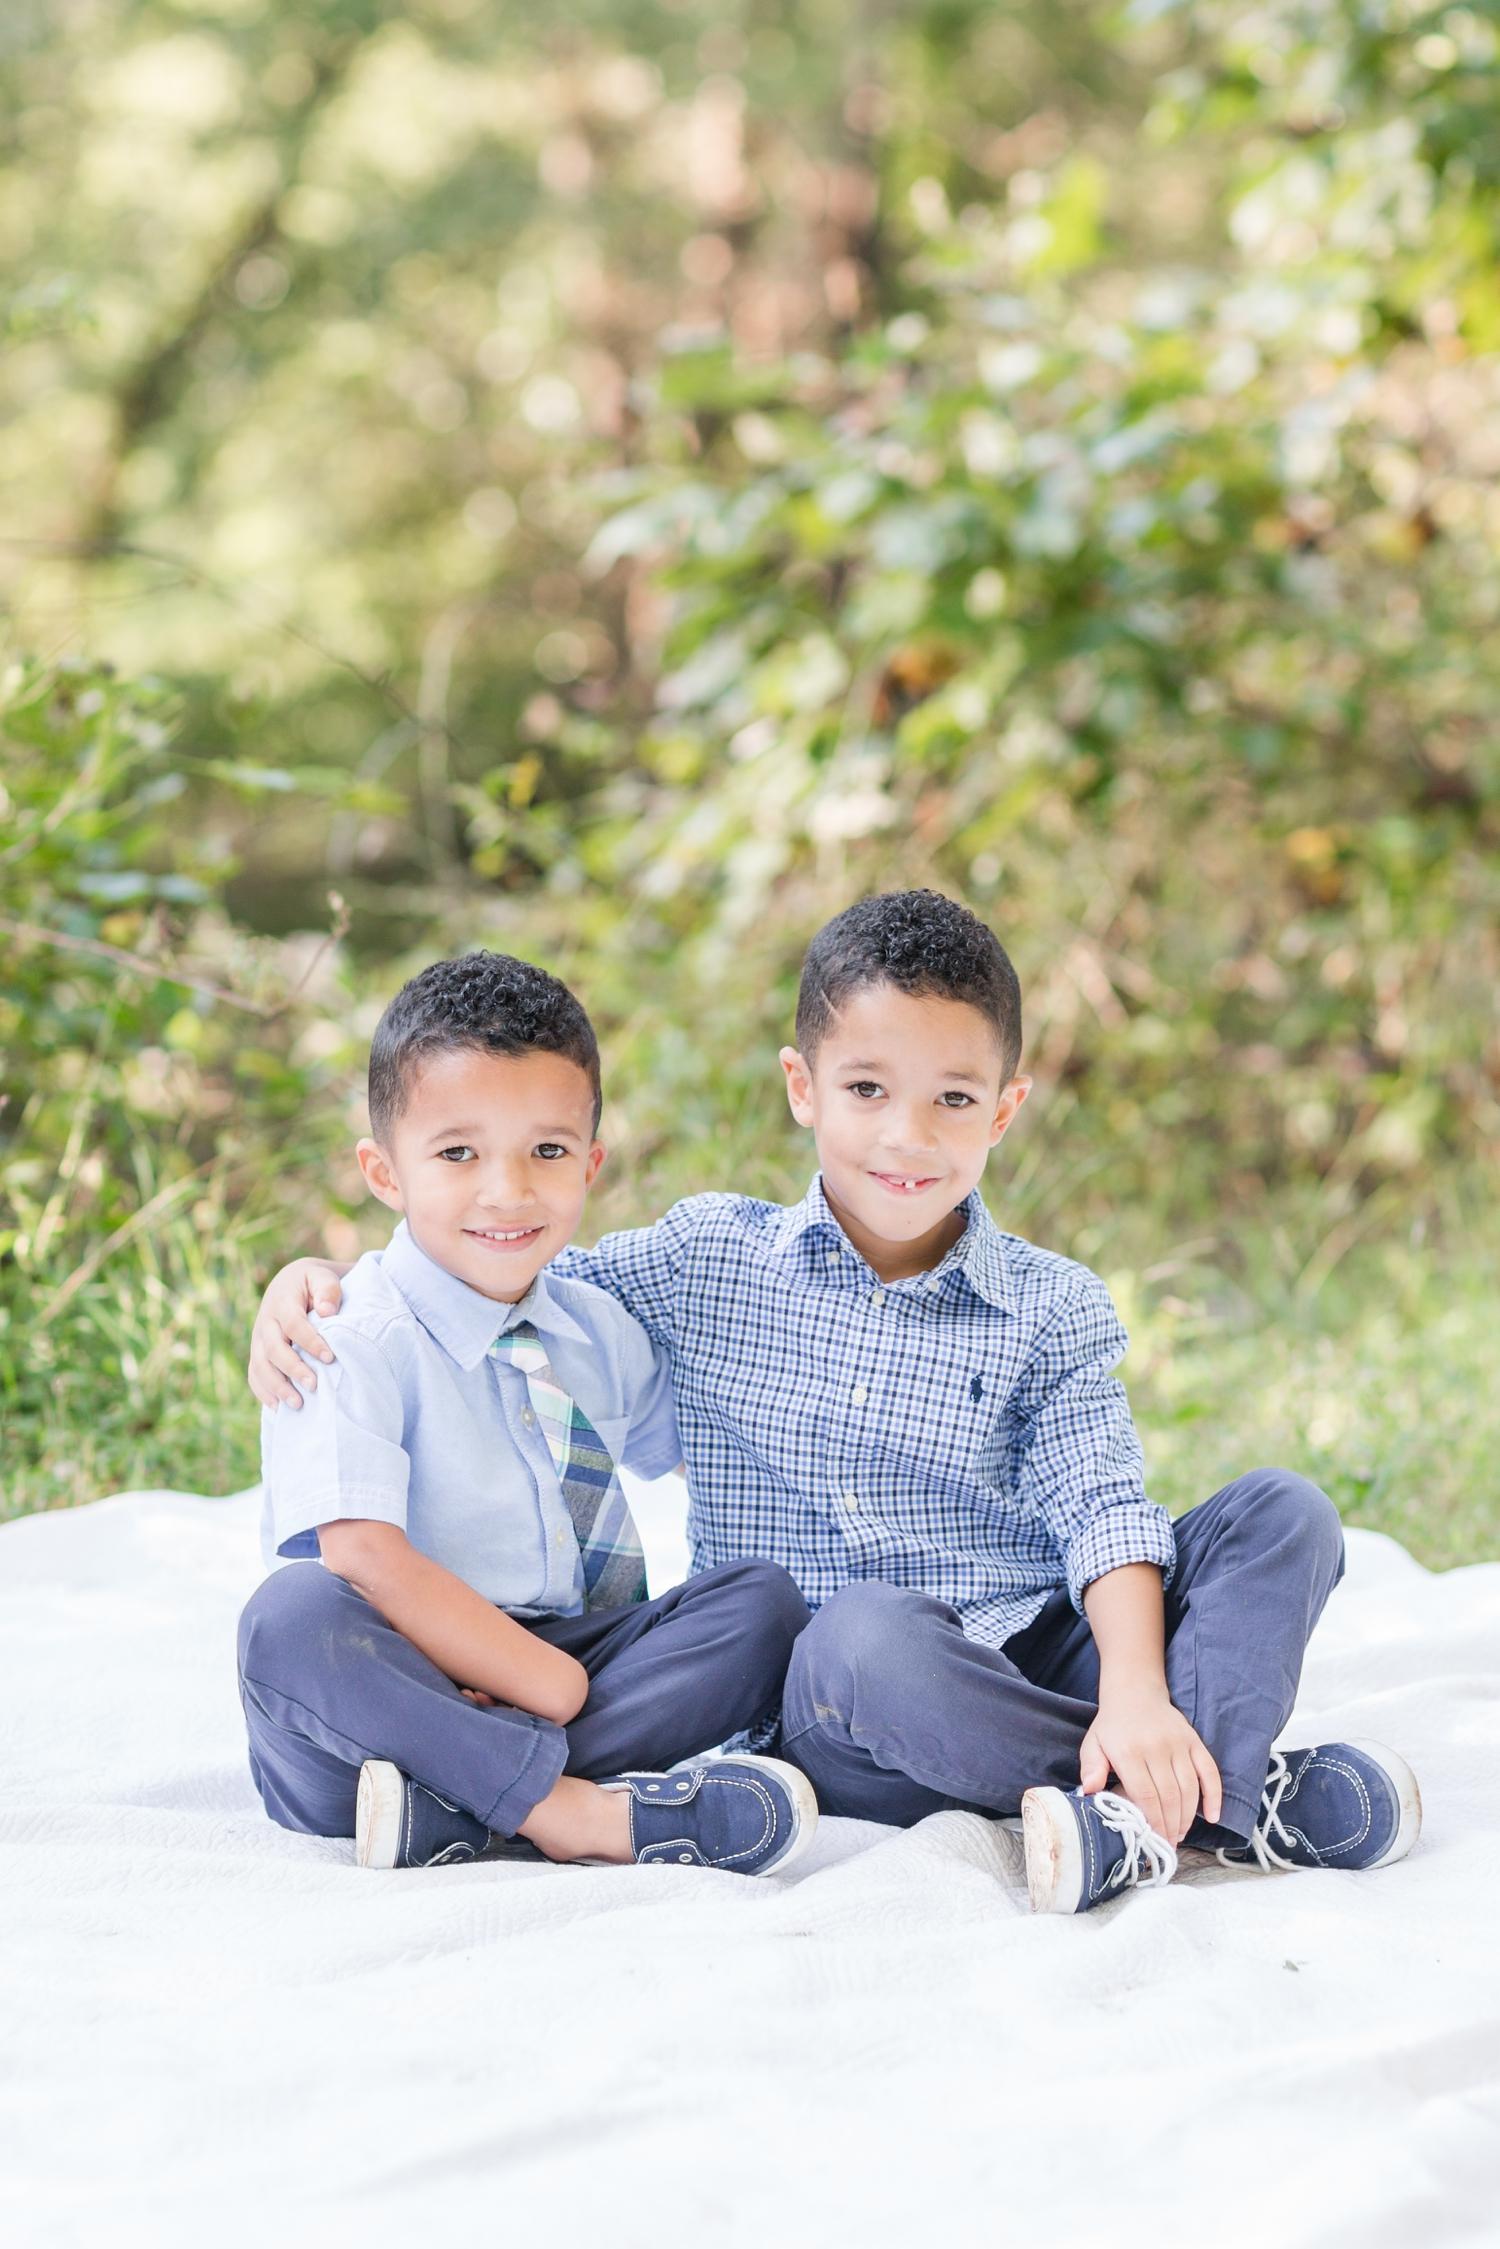 Smith-Padgett Family 2018-45_Jerusalem-Mill-Maryland-Family-Photographer-anna-grace-photography-photo.jpg